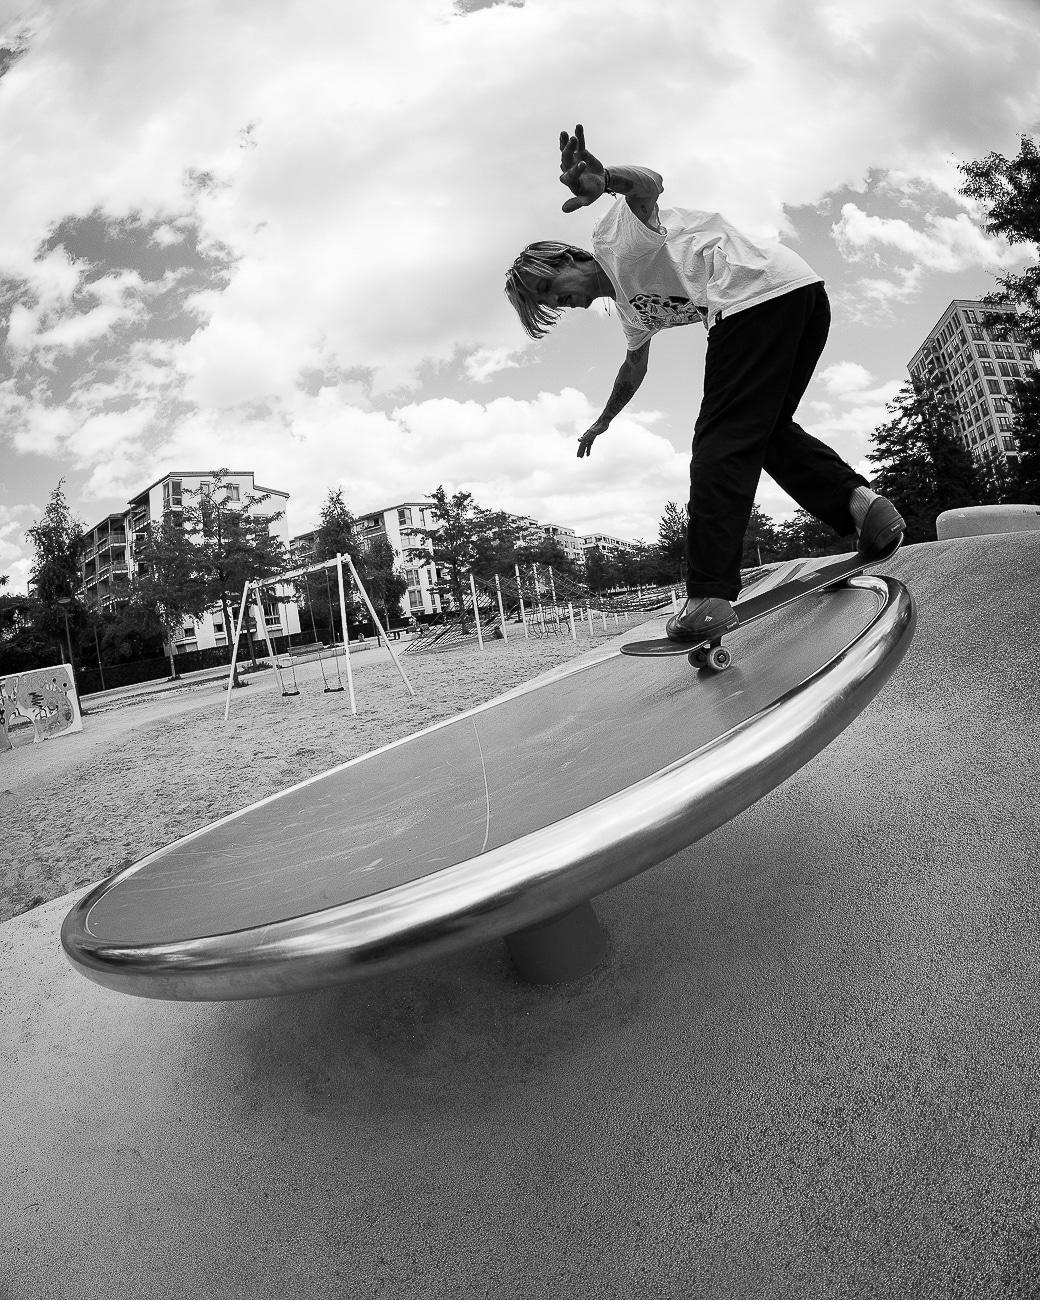 red-bull-skateboard-feinkost-irregularskatemag-fabian-reichenbach-3